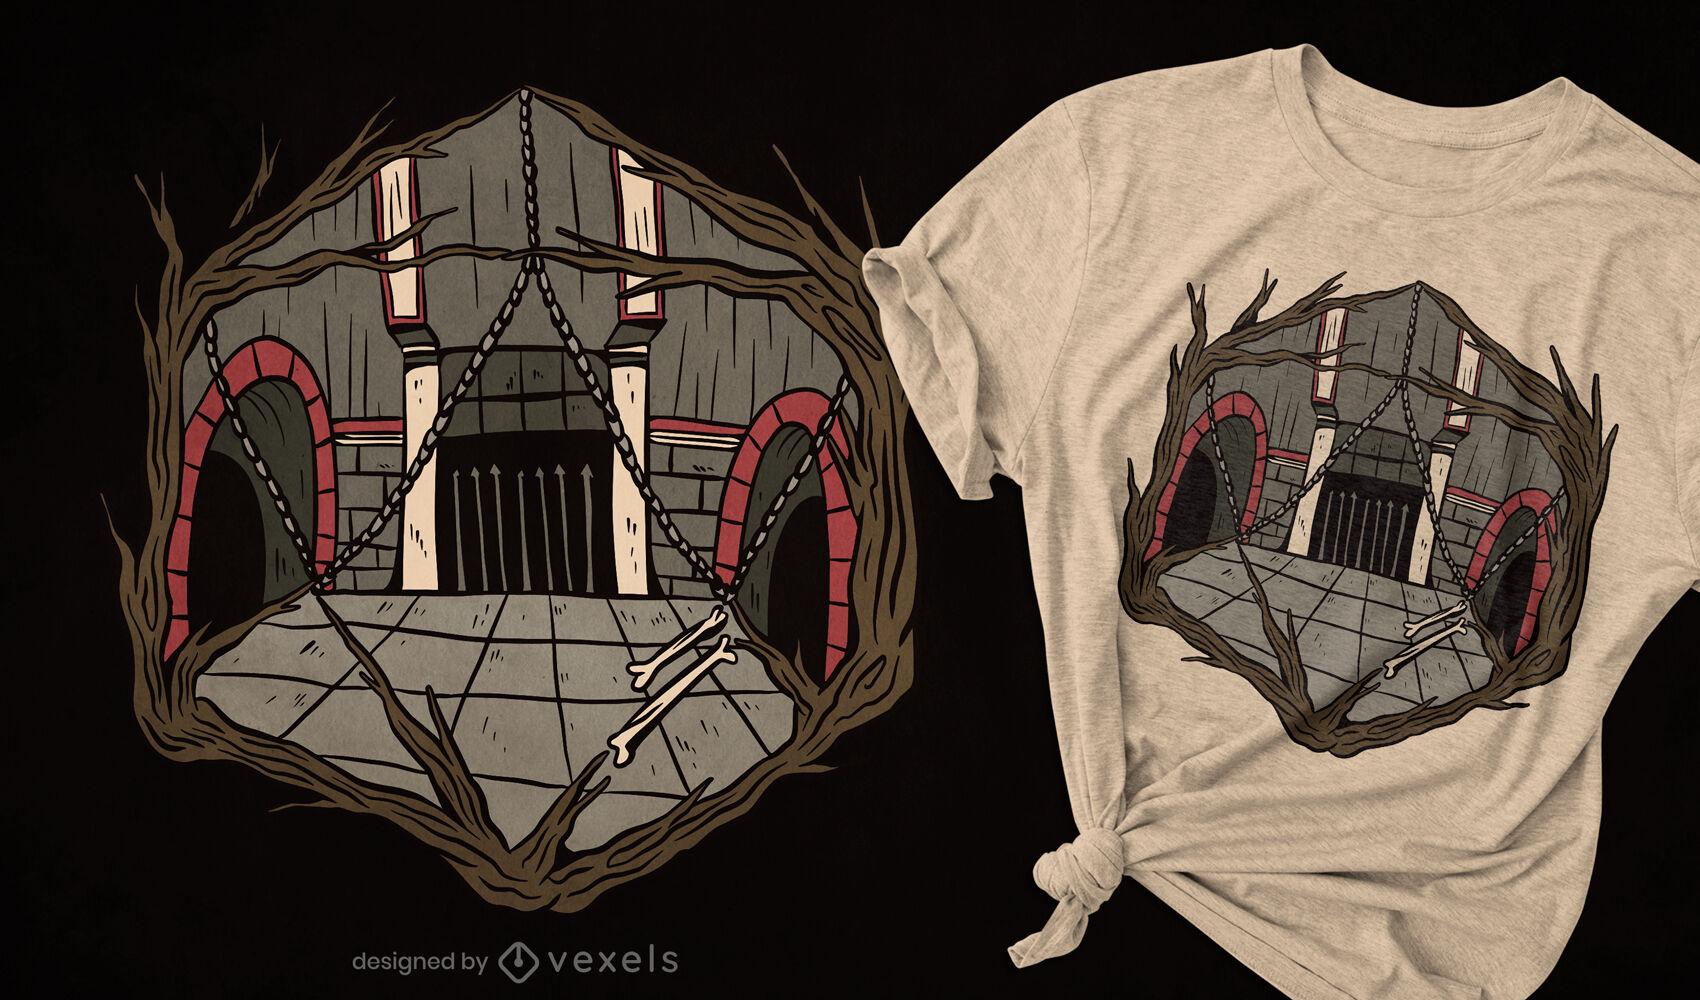 Diseño de camiseta de dados de mazmorra.